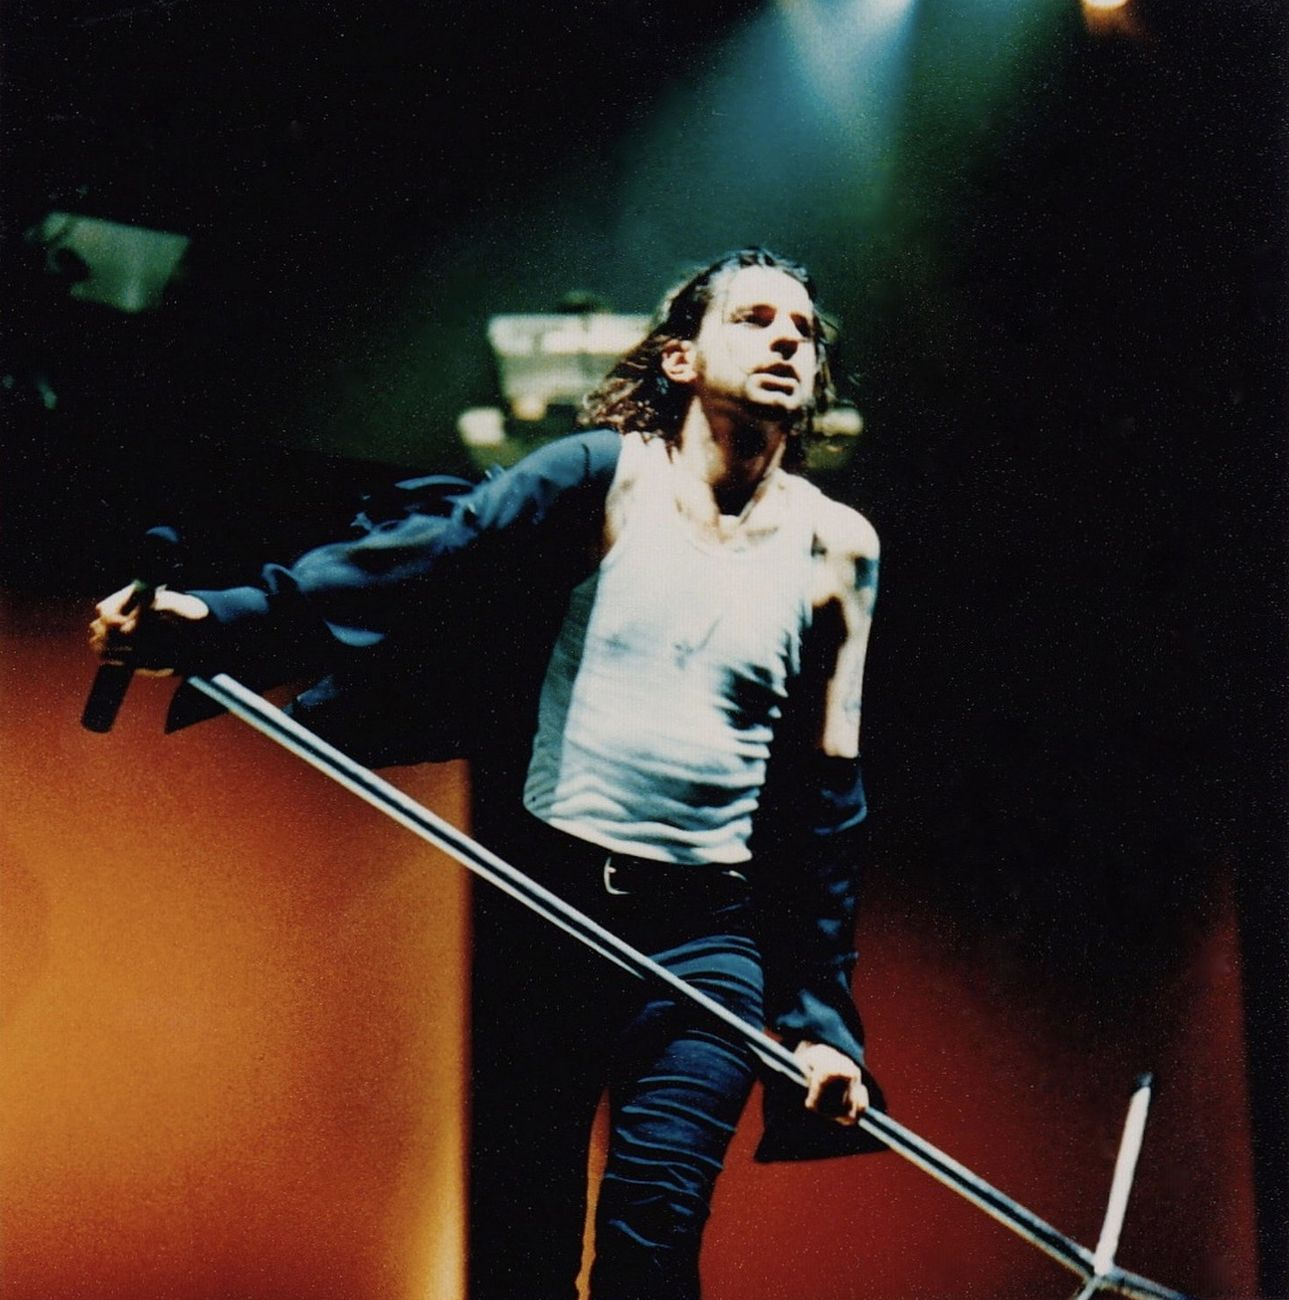 Dave Gahan nel Devotional Tour dei Depeche Mode (1993)